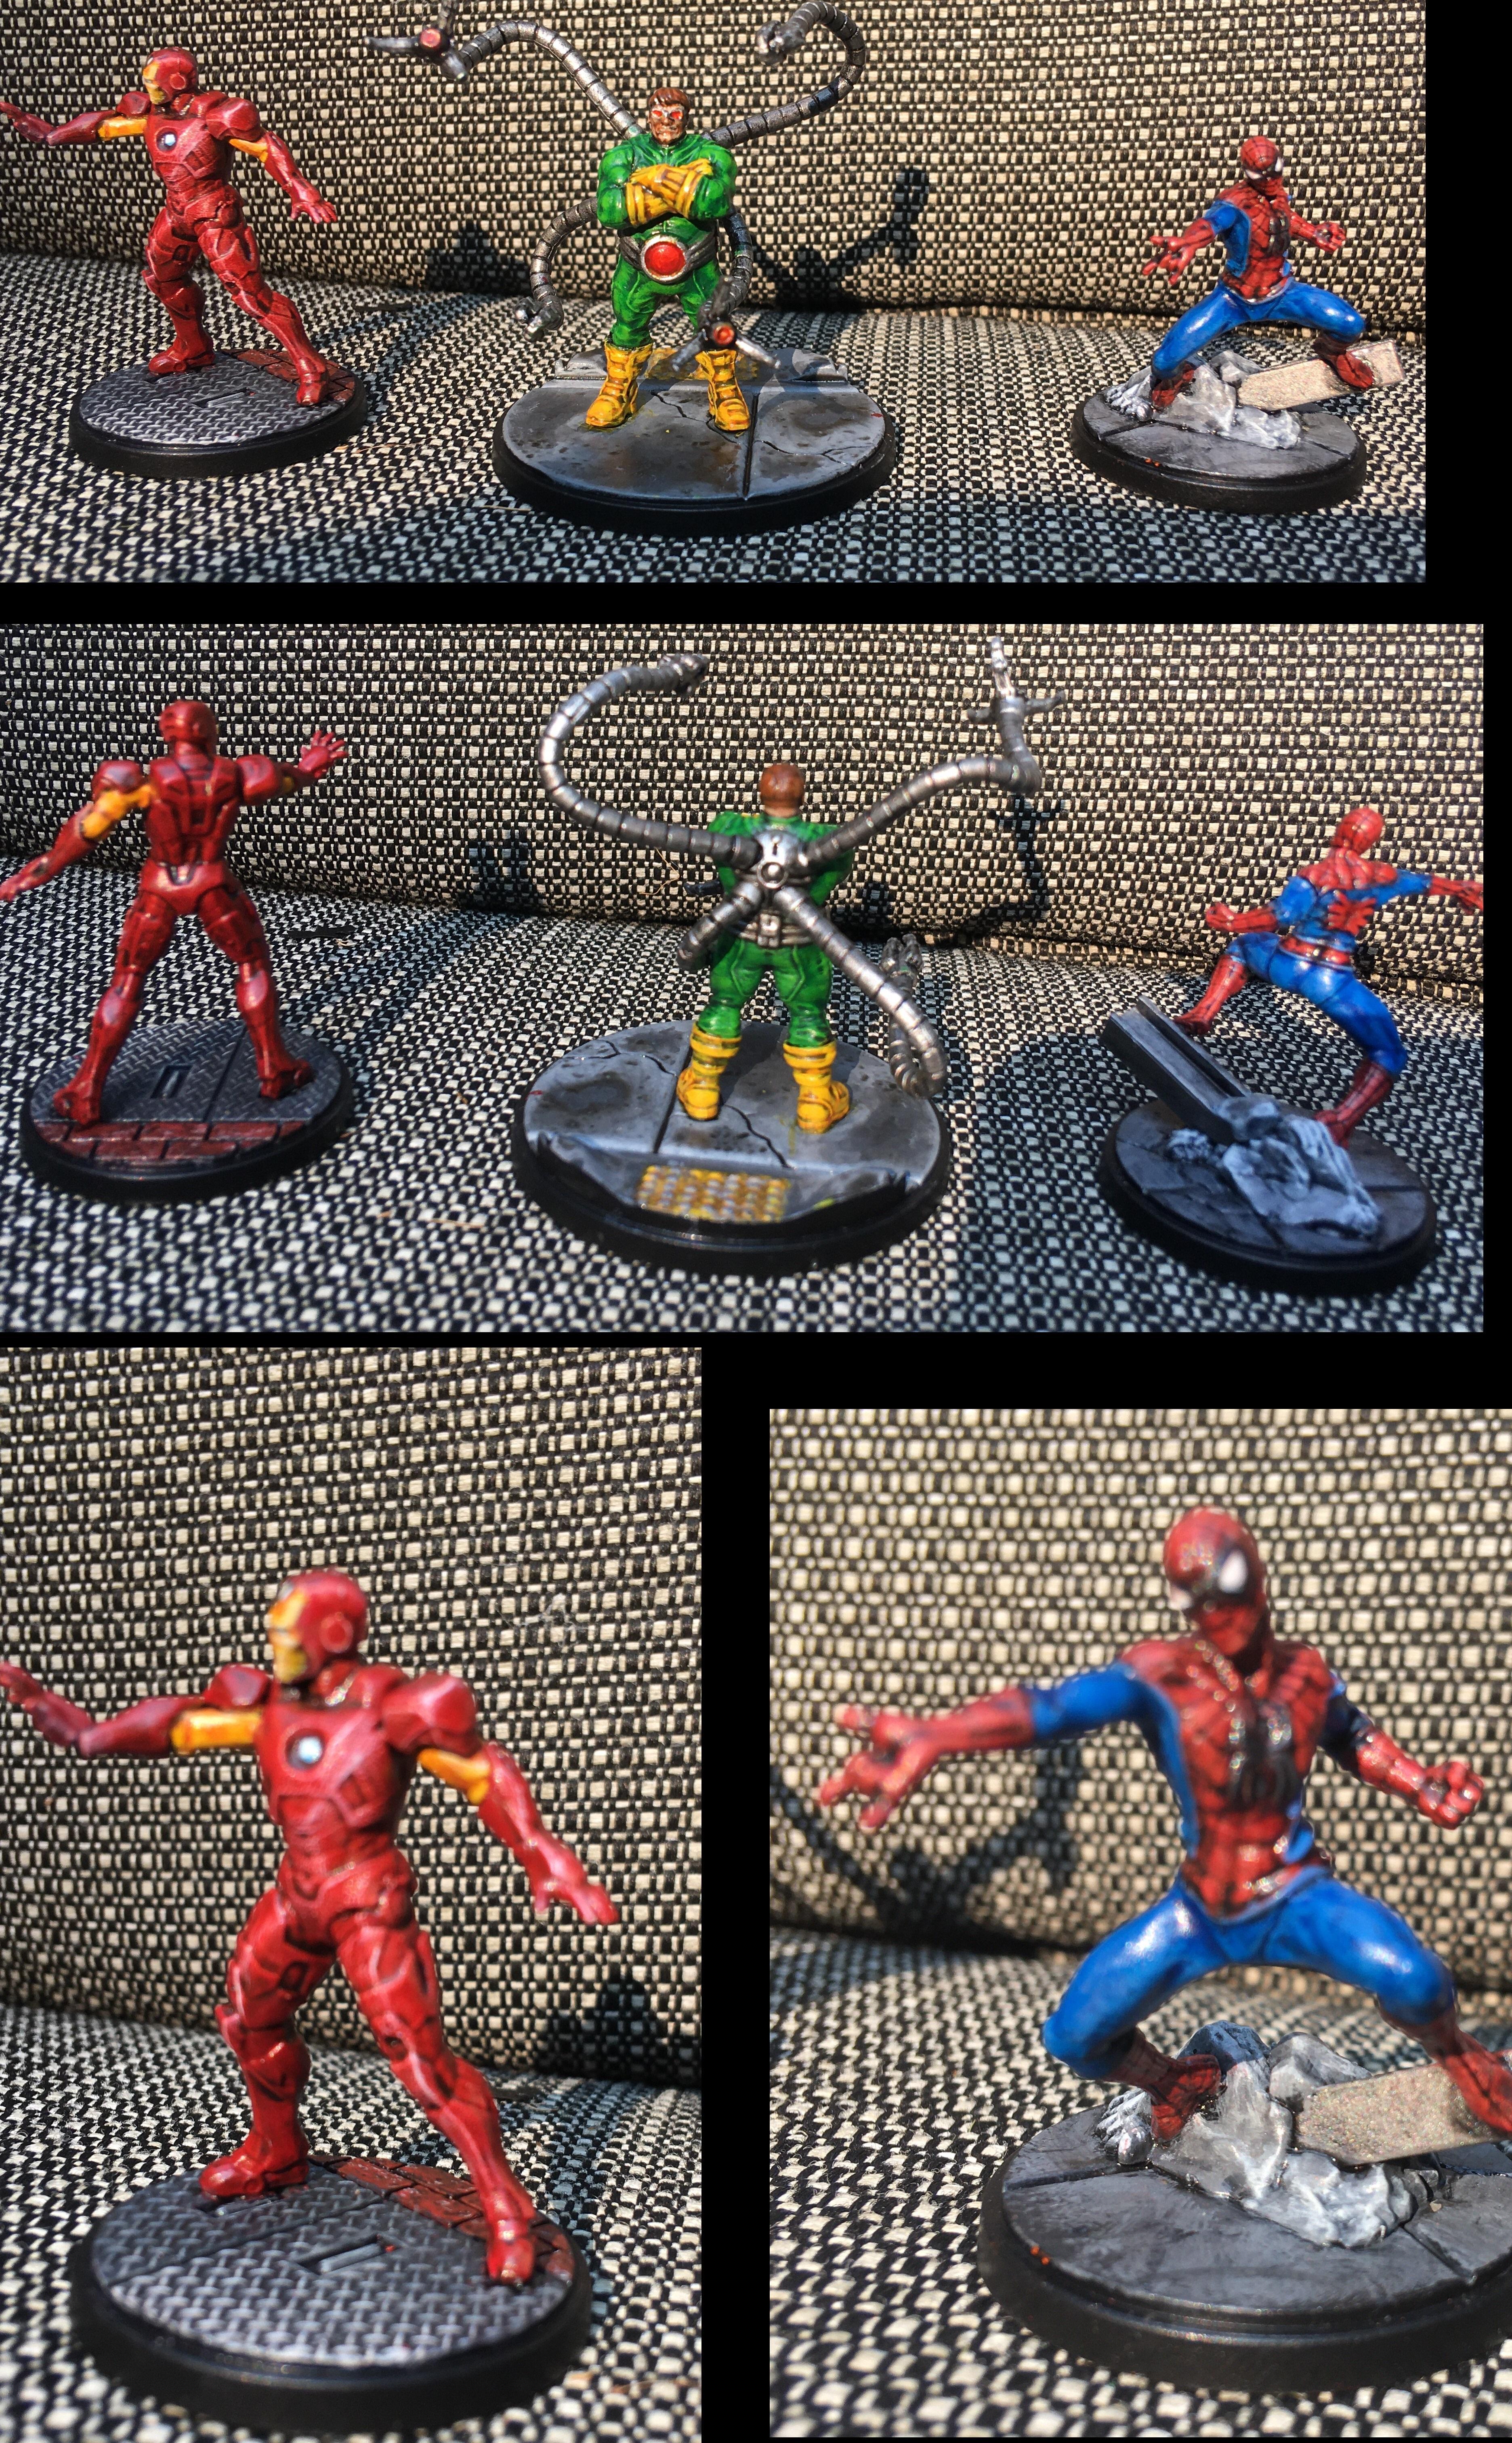 Comic, Comic Book, Doctor, Iron Man, Marvel, Octopus, Spider Man, Superhero